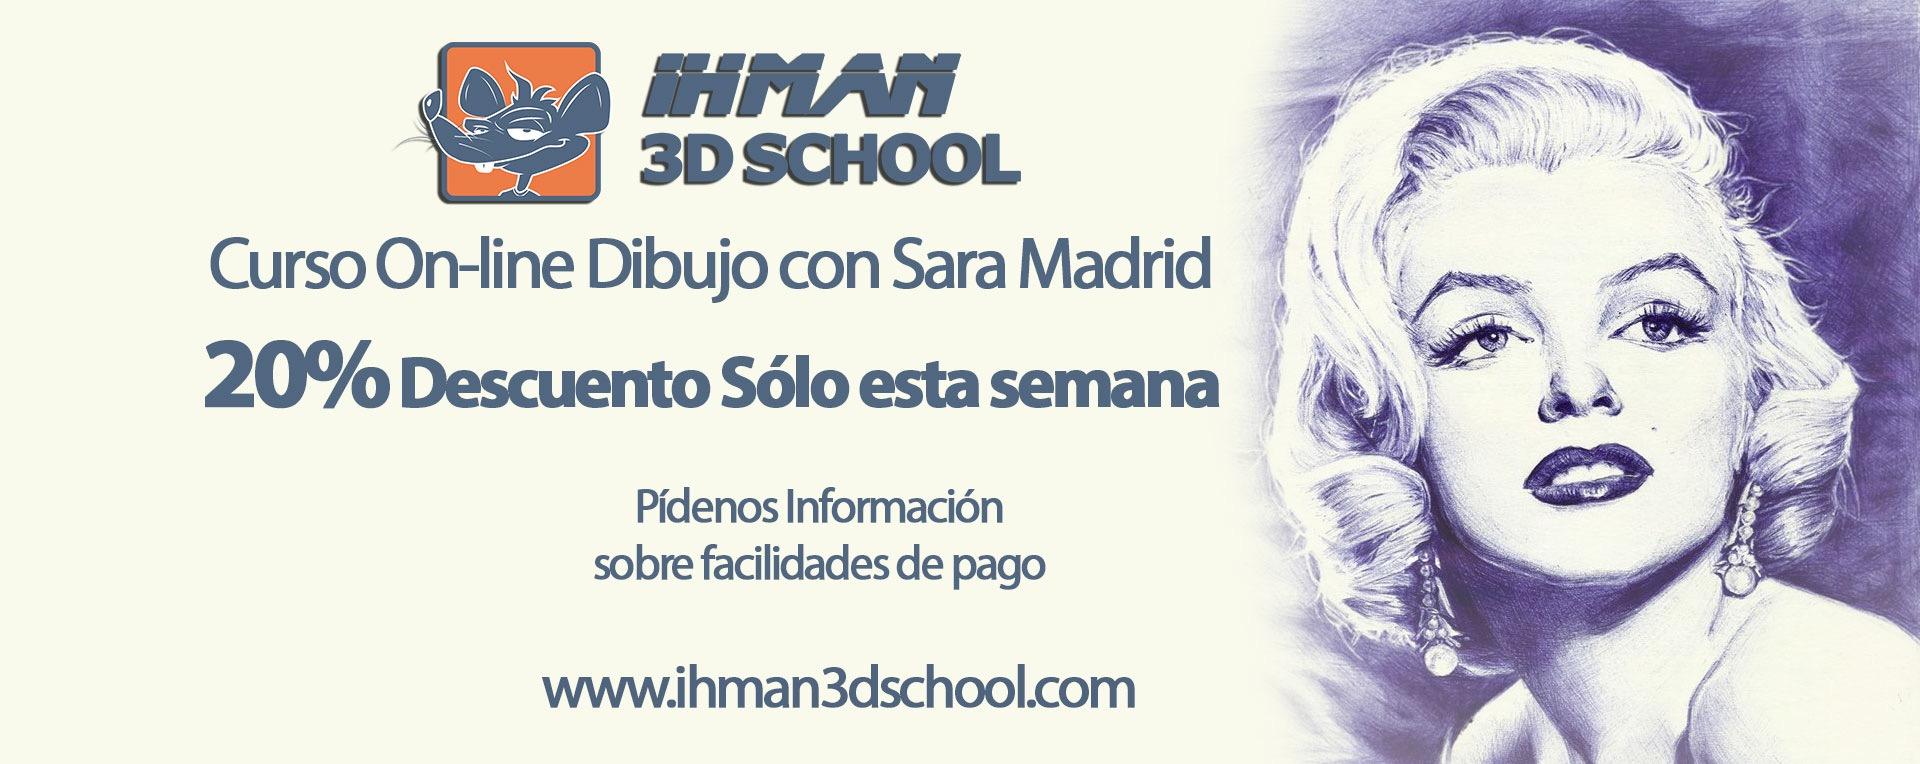 Presentación ihman 3d school-image.jpeg